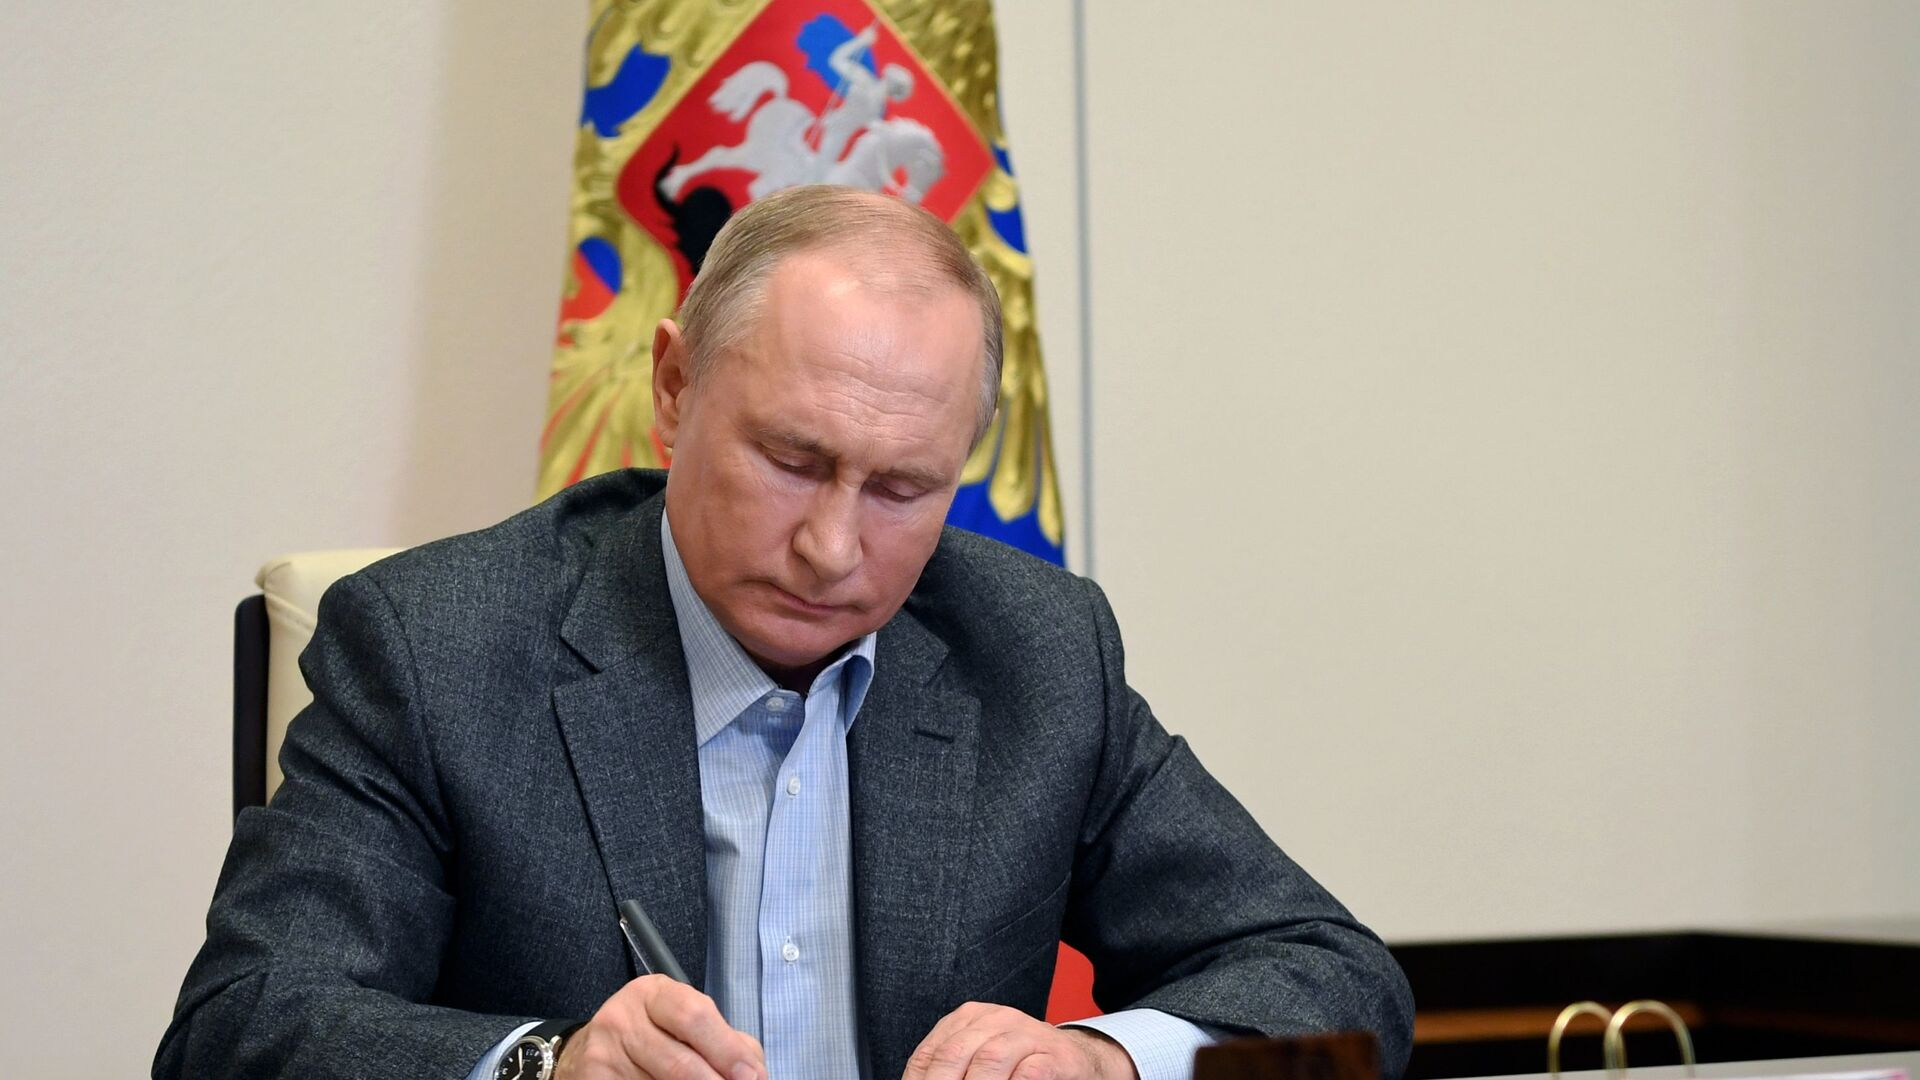 Президент РФ Владимир Путин во время встречи в режиме видеоконференции, фото из архива - Sputnik Азербайджан, 1920, 16.05.2021